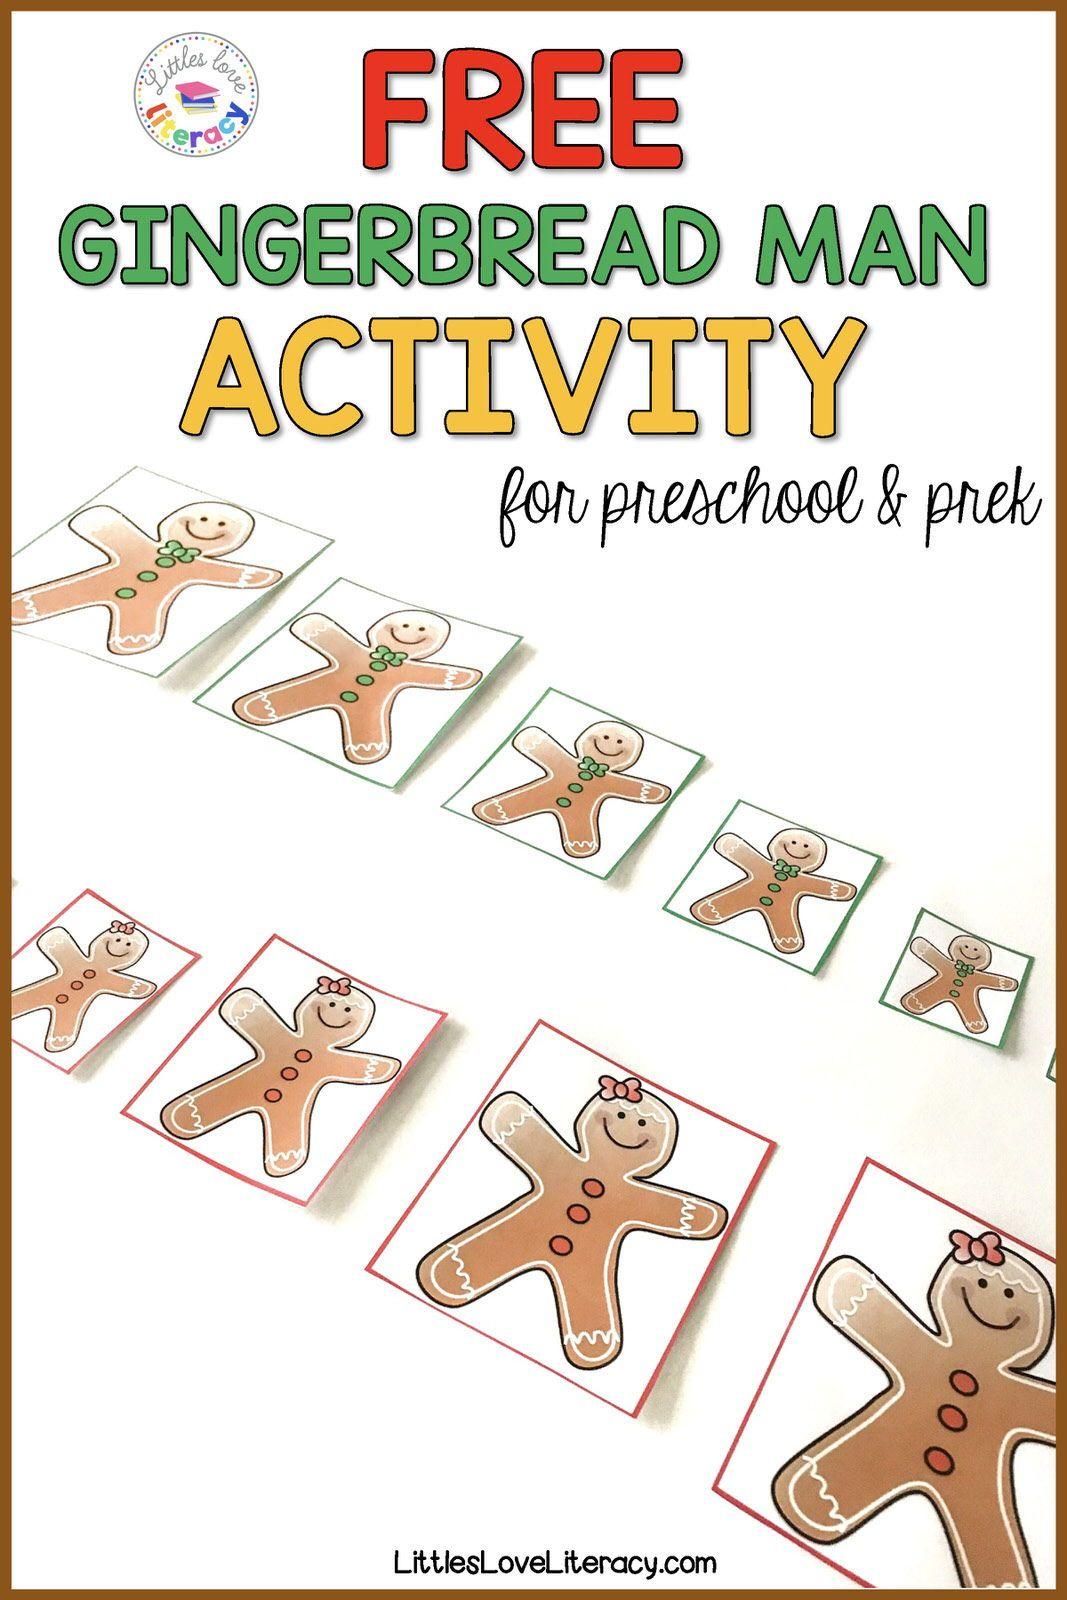 Fun And Free Ninjabread Man Activities For Preschool Pre K Free Preschool Printables Gingerbread Man Activities December Lesson Plans [ 1600 x 1067 Pixel ]